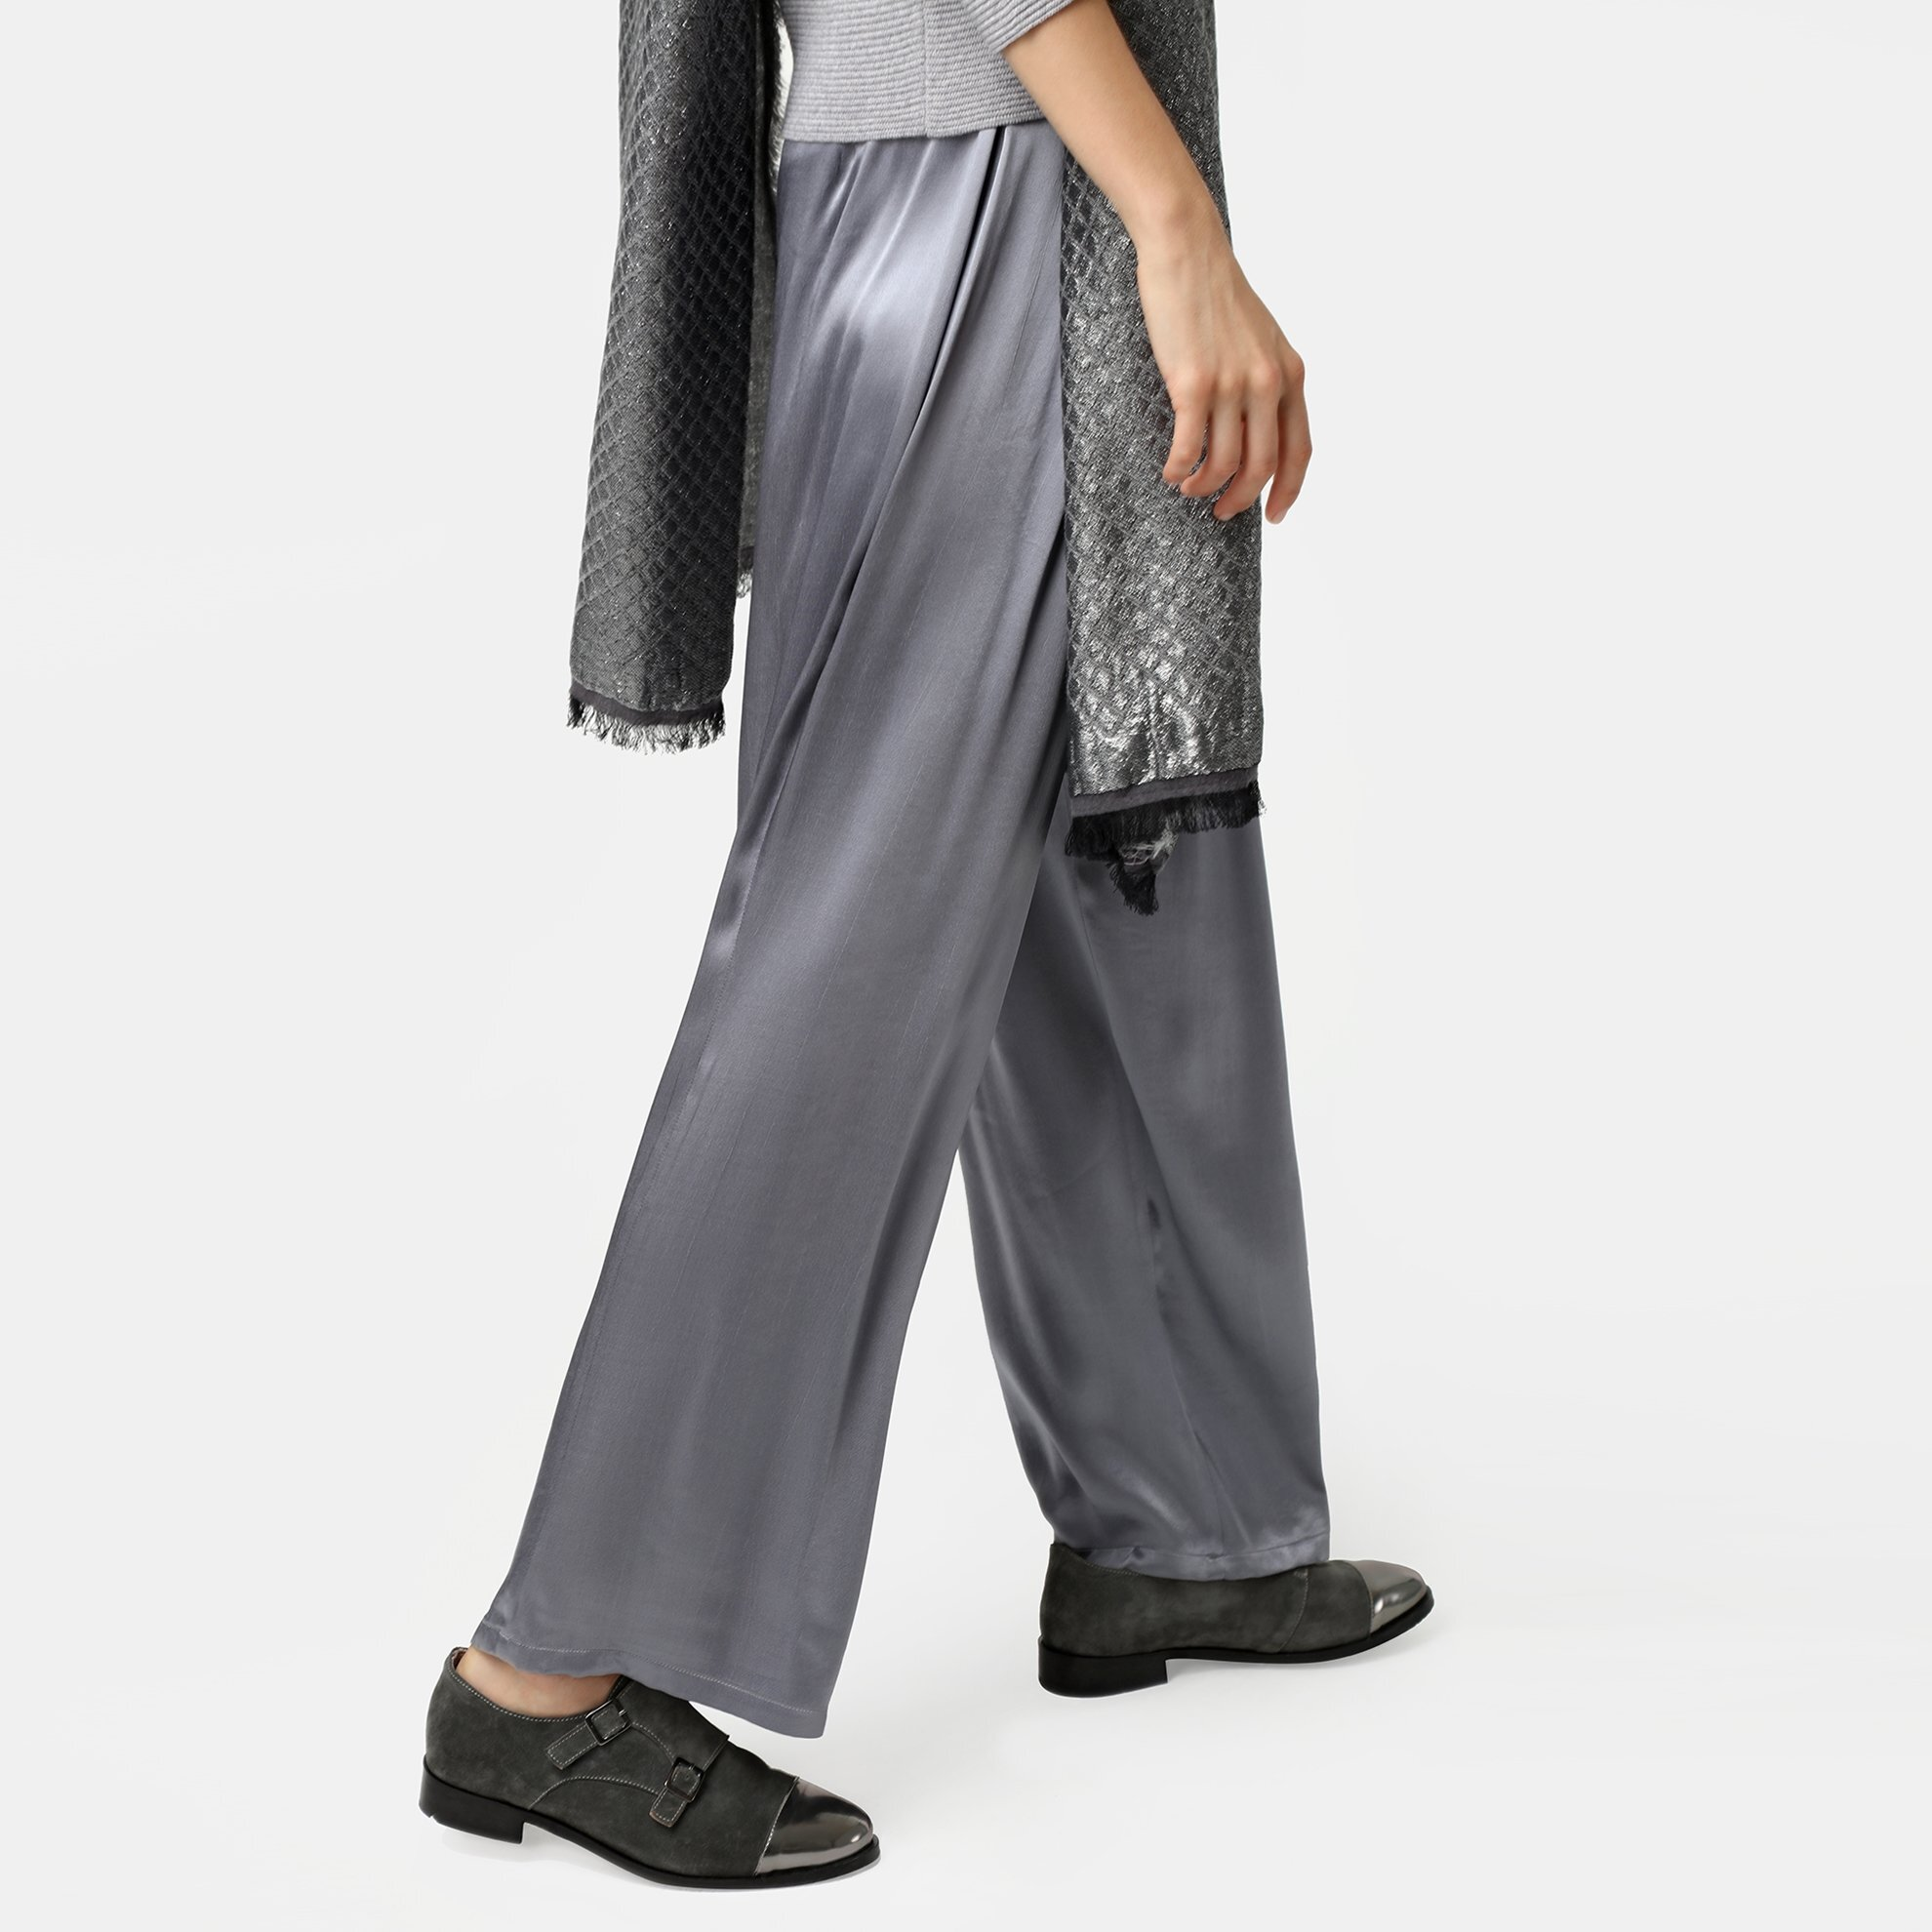 resm Büzgü Detaylı Geniş Paça Pantolon